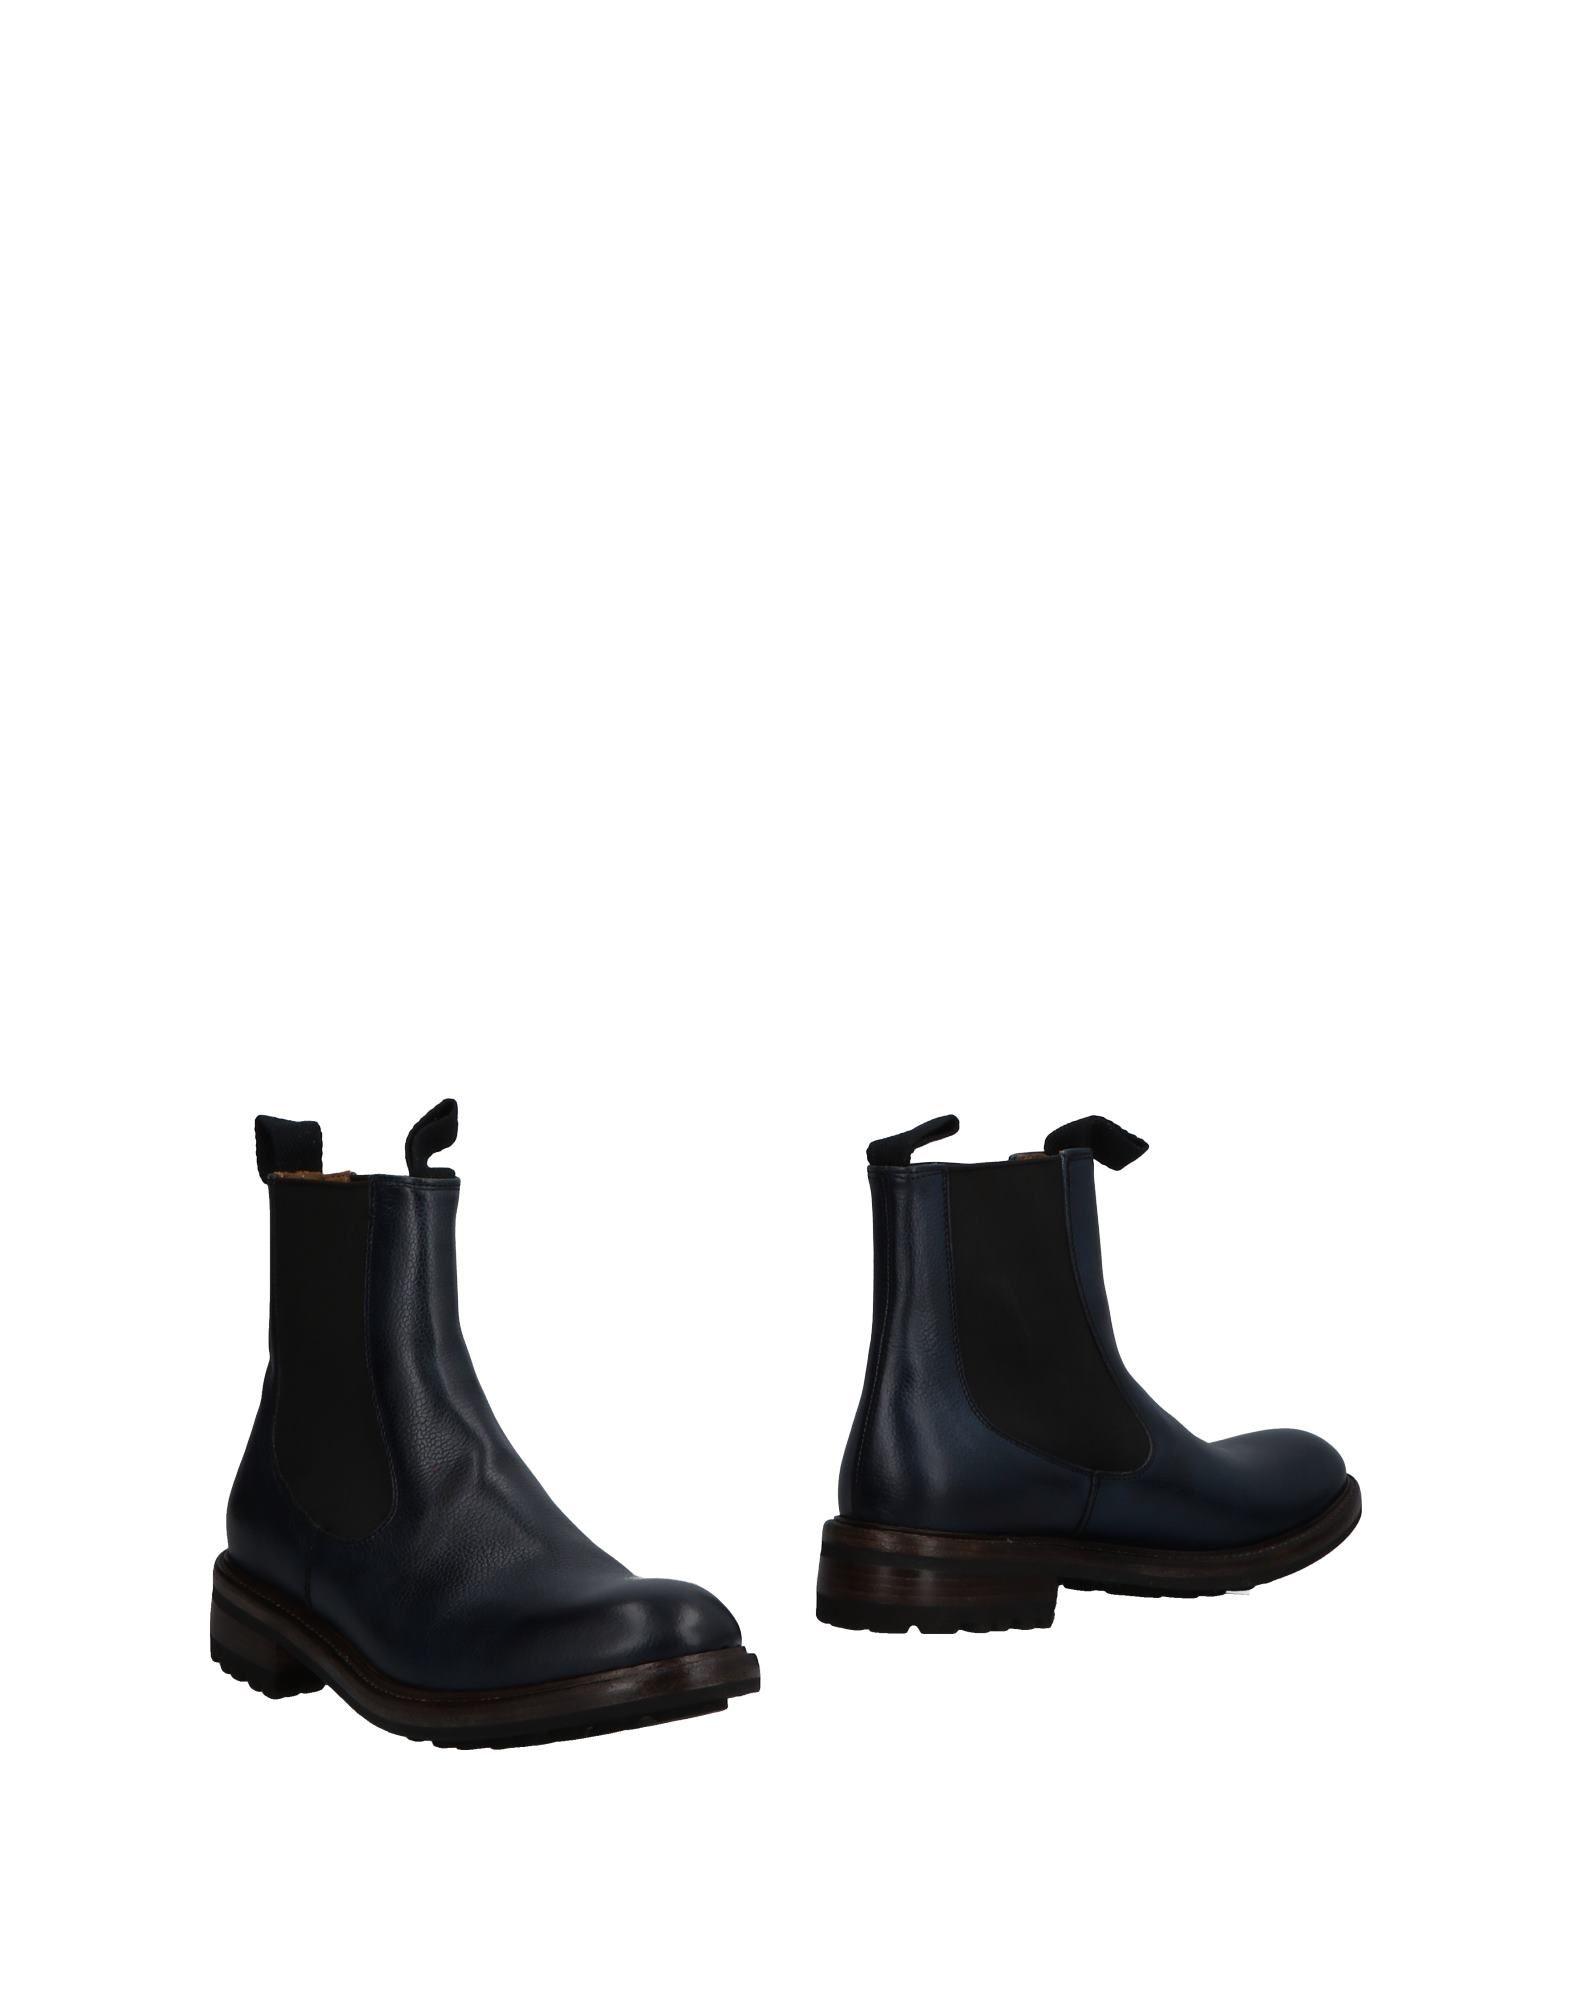 Janemox By Righi Women Jr Ankle Boot - Women Righi Janemox By Righi Jr Ankle Boots online on  United Kingdom - 11485522VP 6bb667